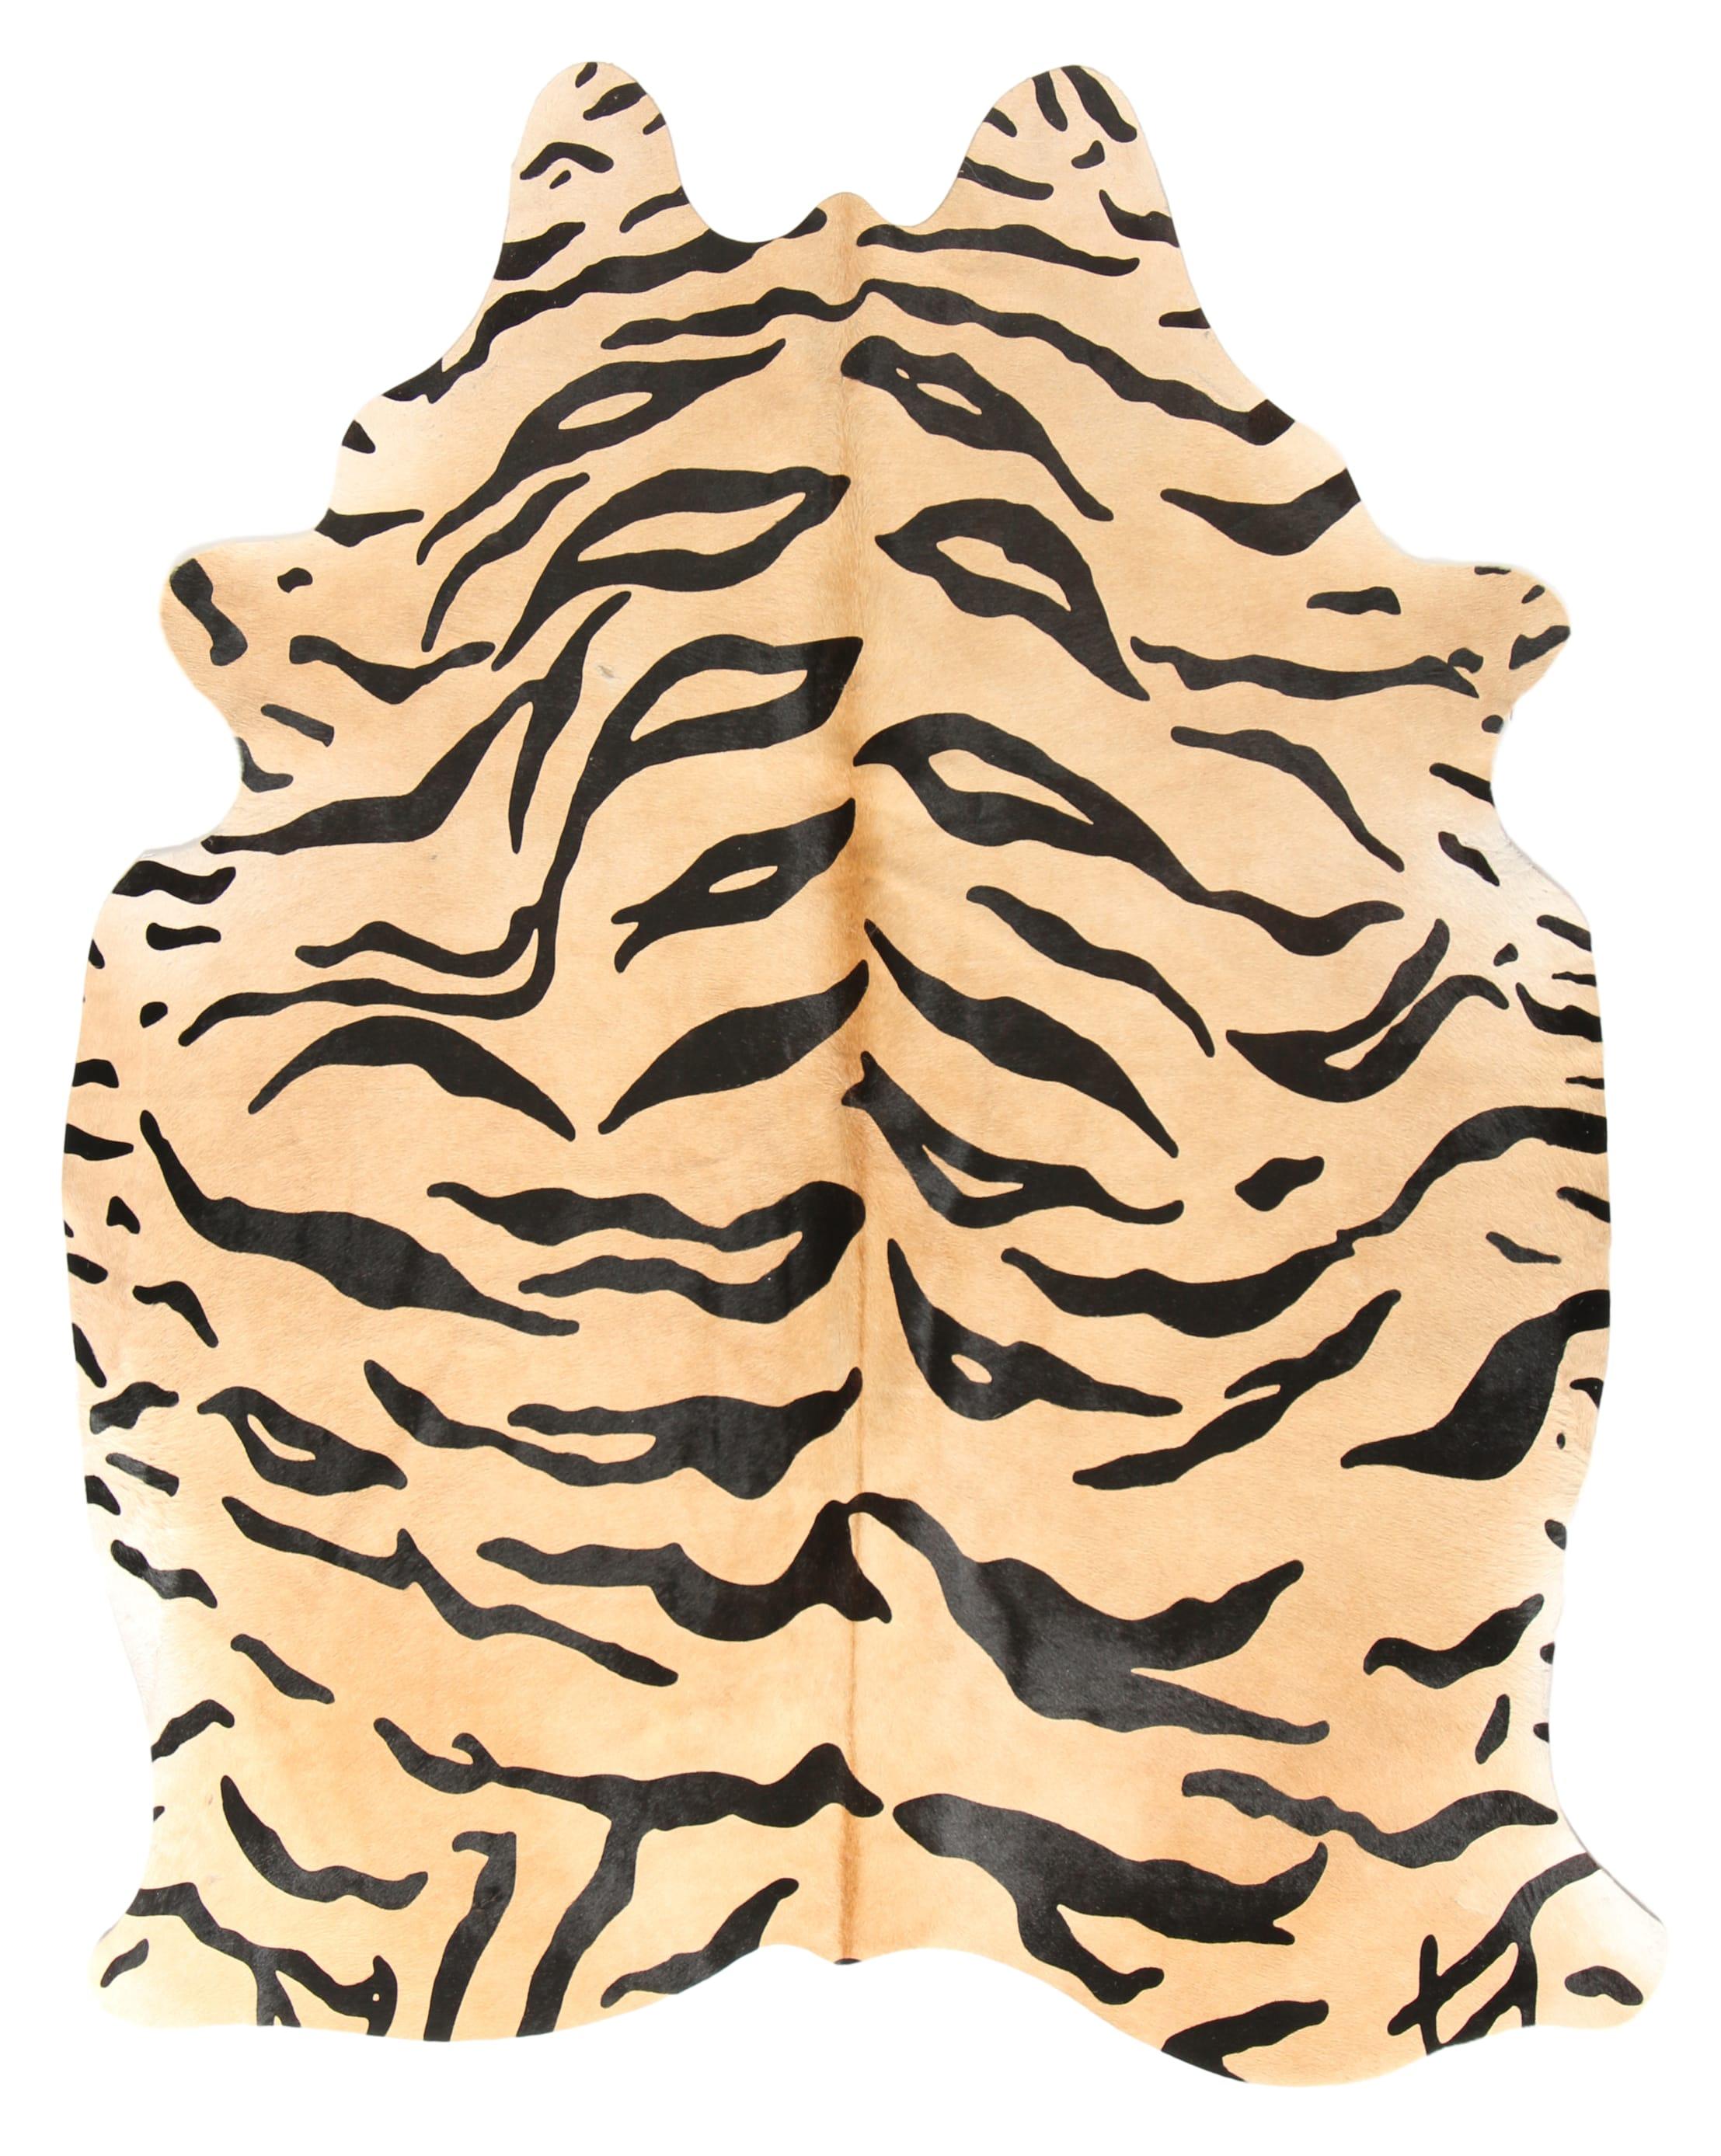 Tapis en peau de vache imprimé safari tigre 180x200